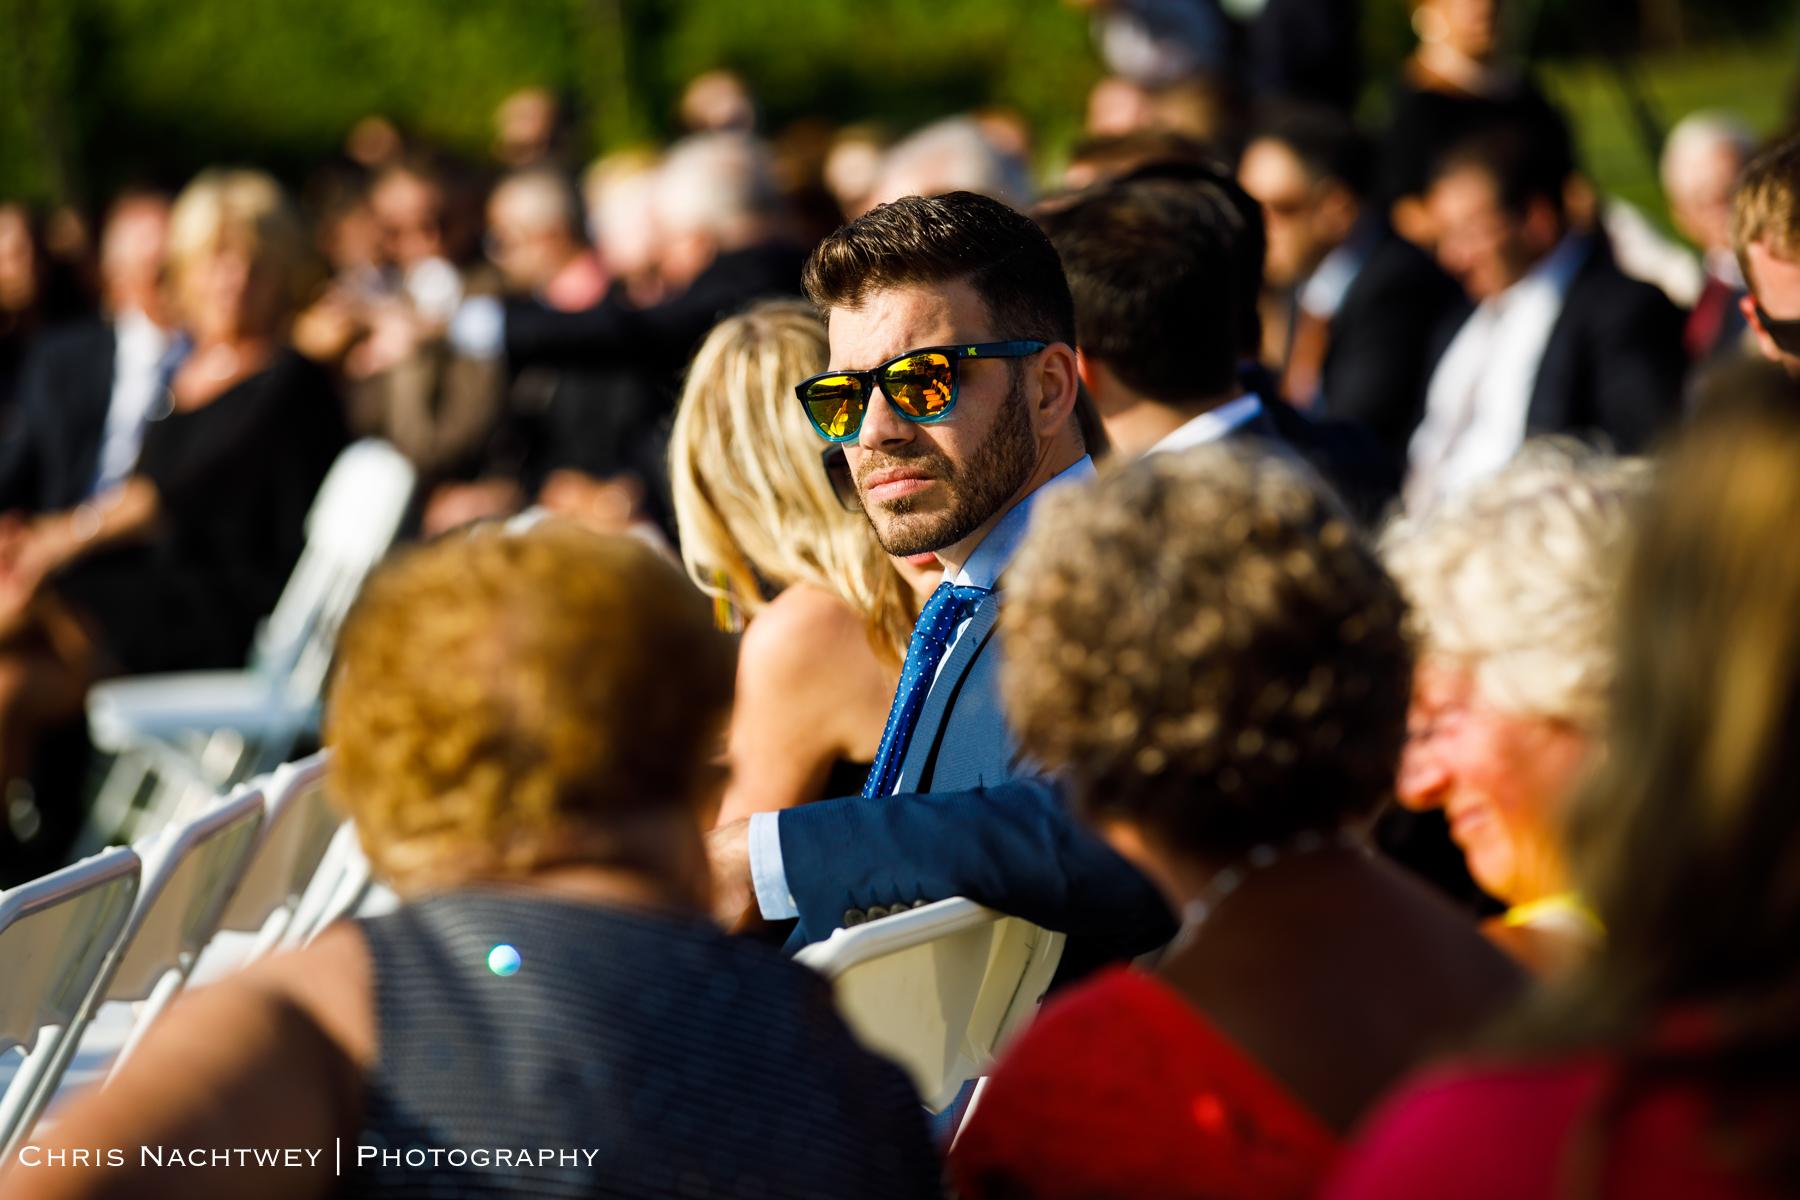 wedding-lake-of-isles-photos-chris-nachtwey-photography-2019-27.jpg